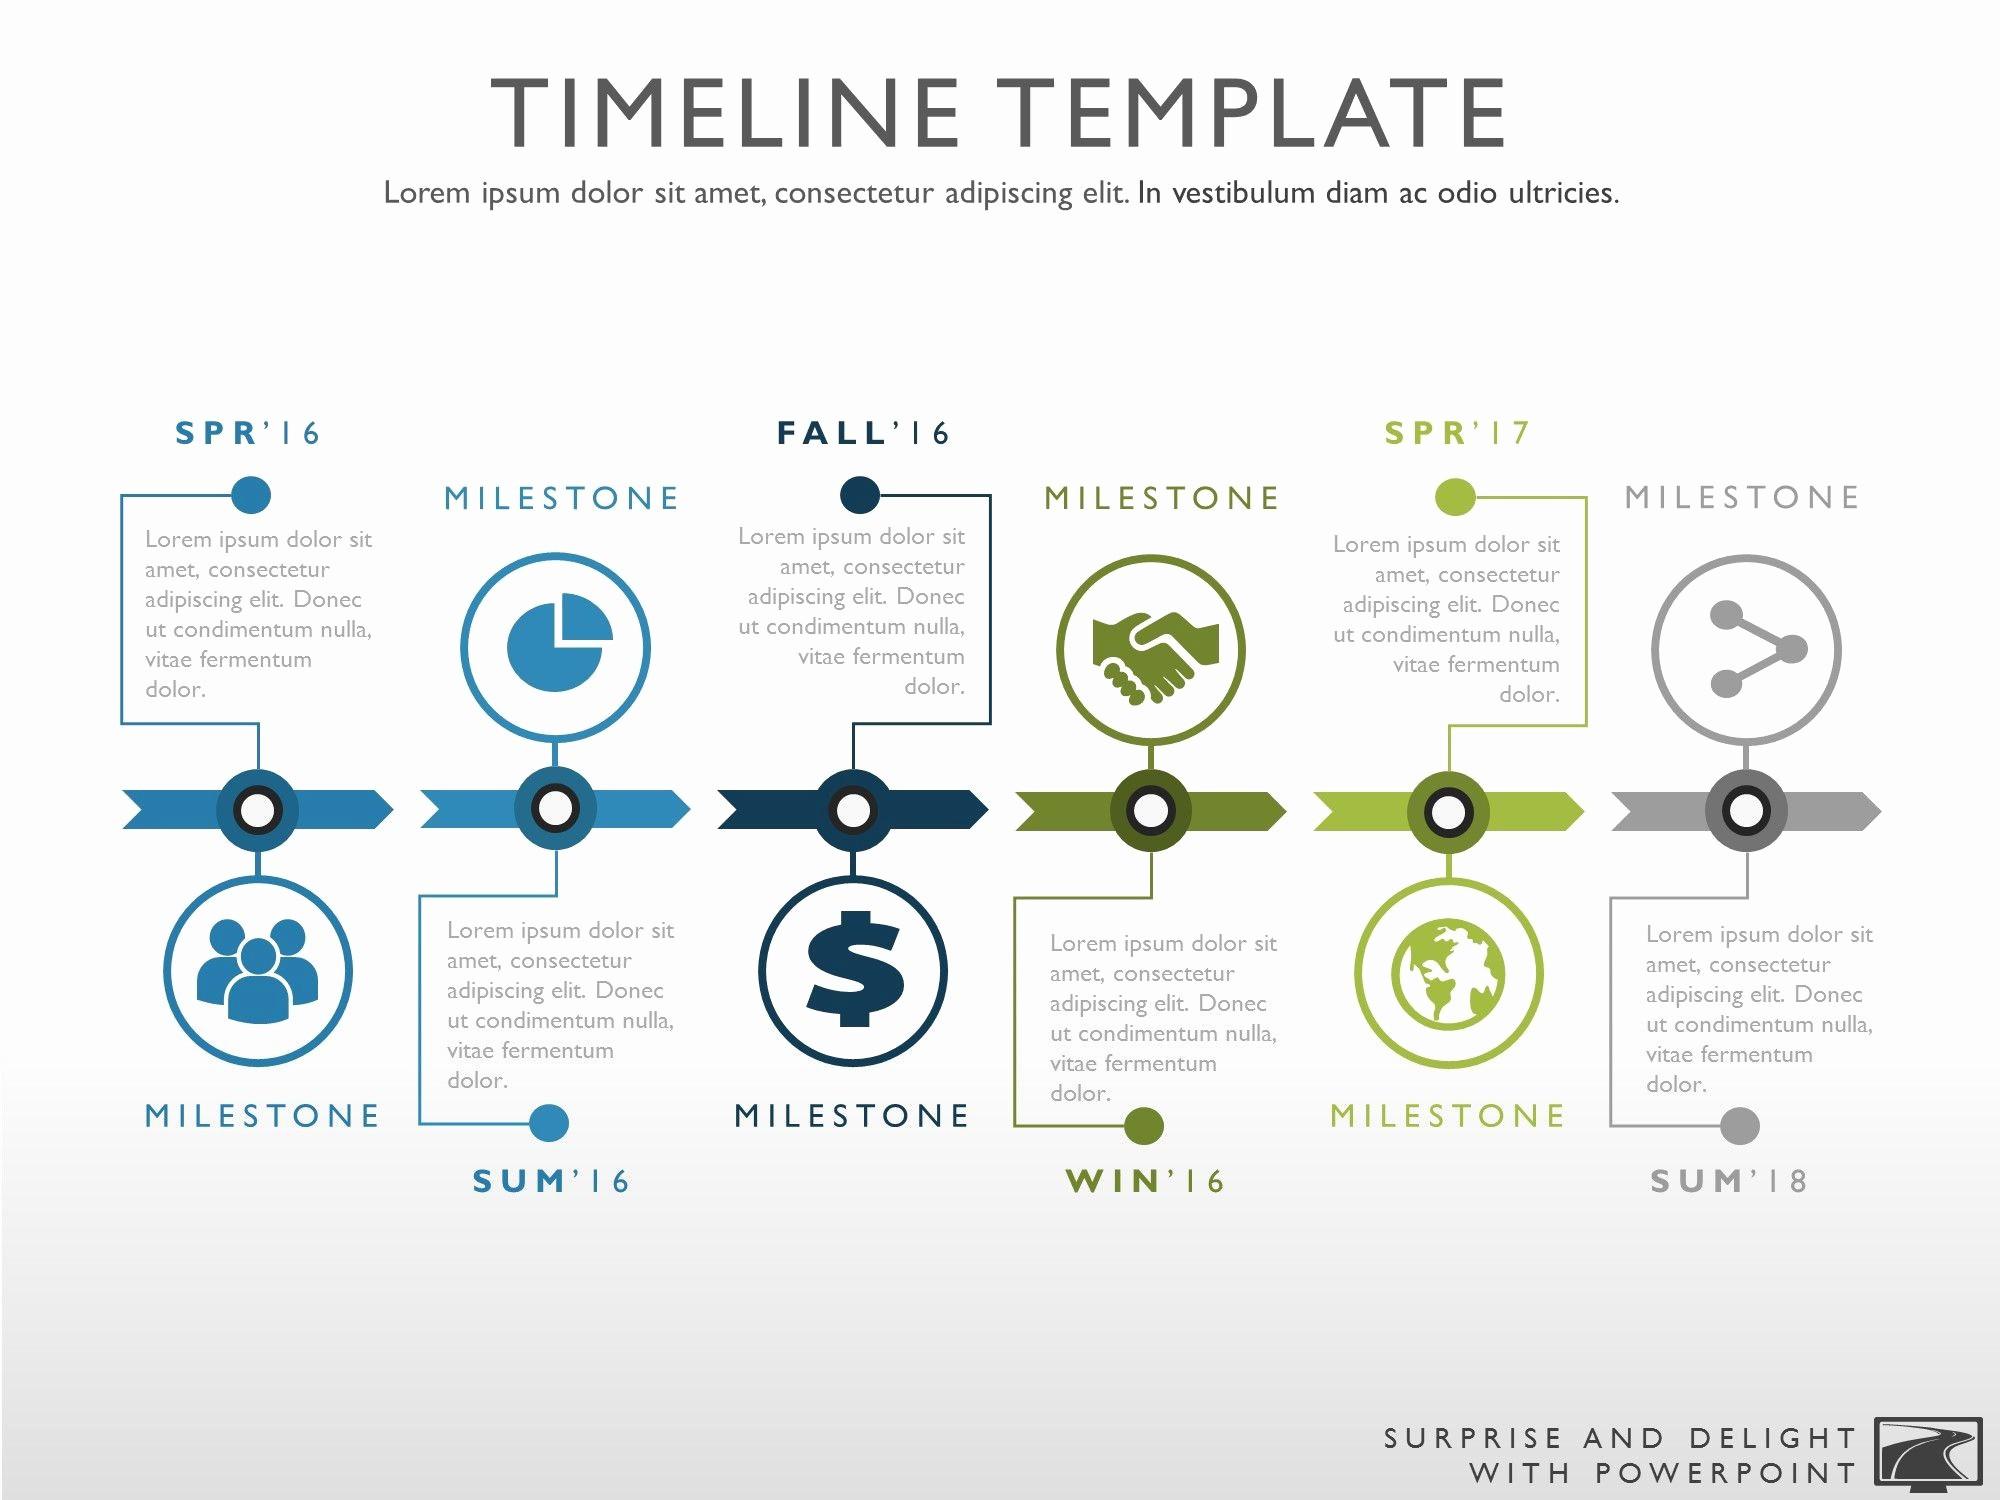 Free Project Management Timeline Template Awesome Timeline Template for Powerpoint Great Project Management